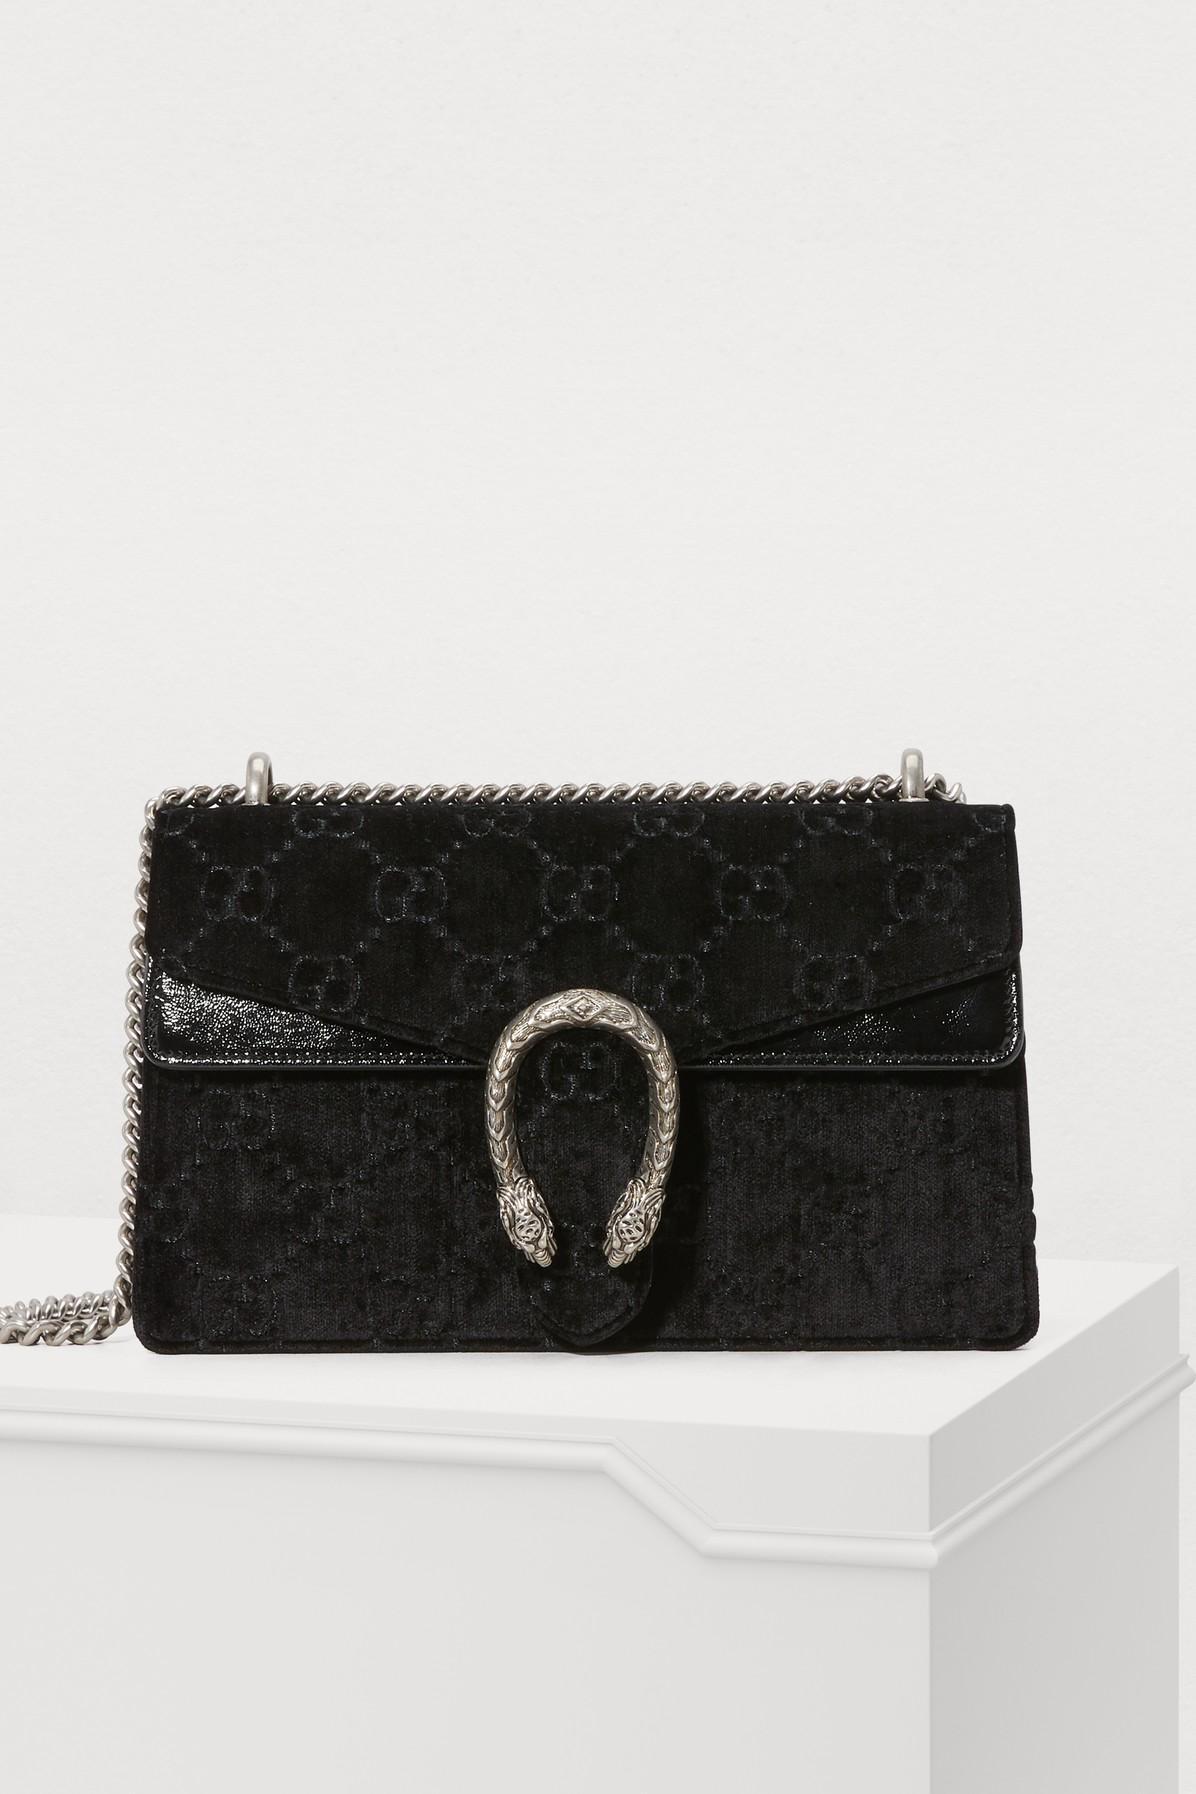 a292c39e471 Lyst - Gucci Dionysus GG Velvet Small Shoulder Bag in Black - Save 21%